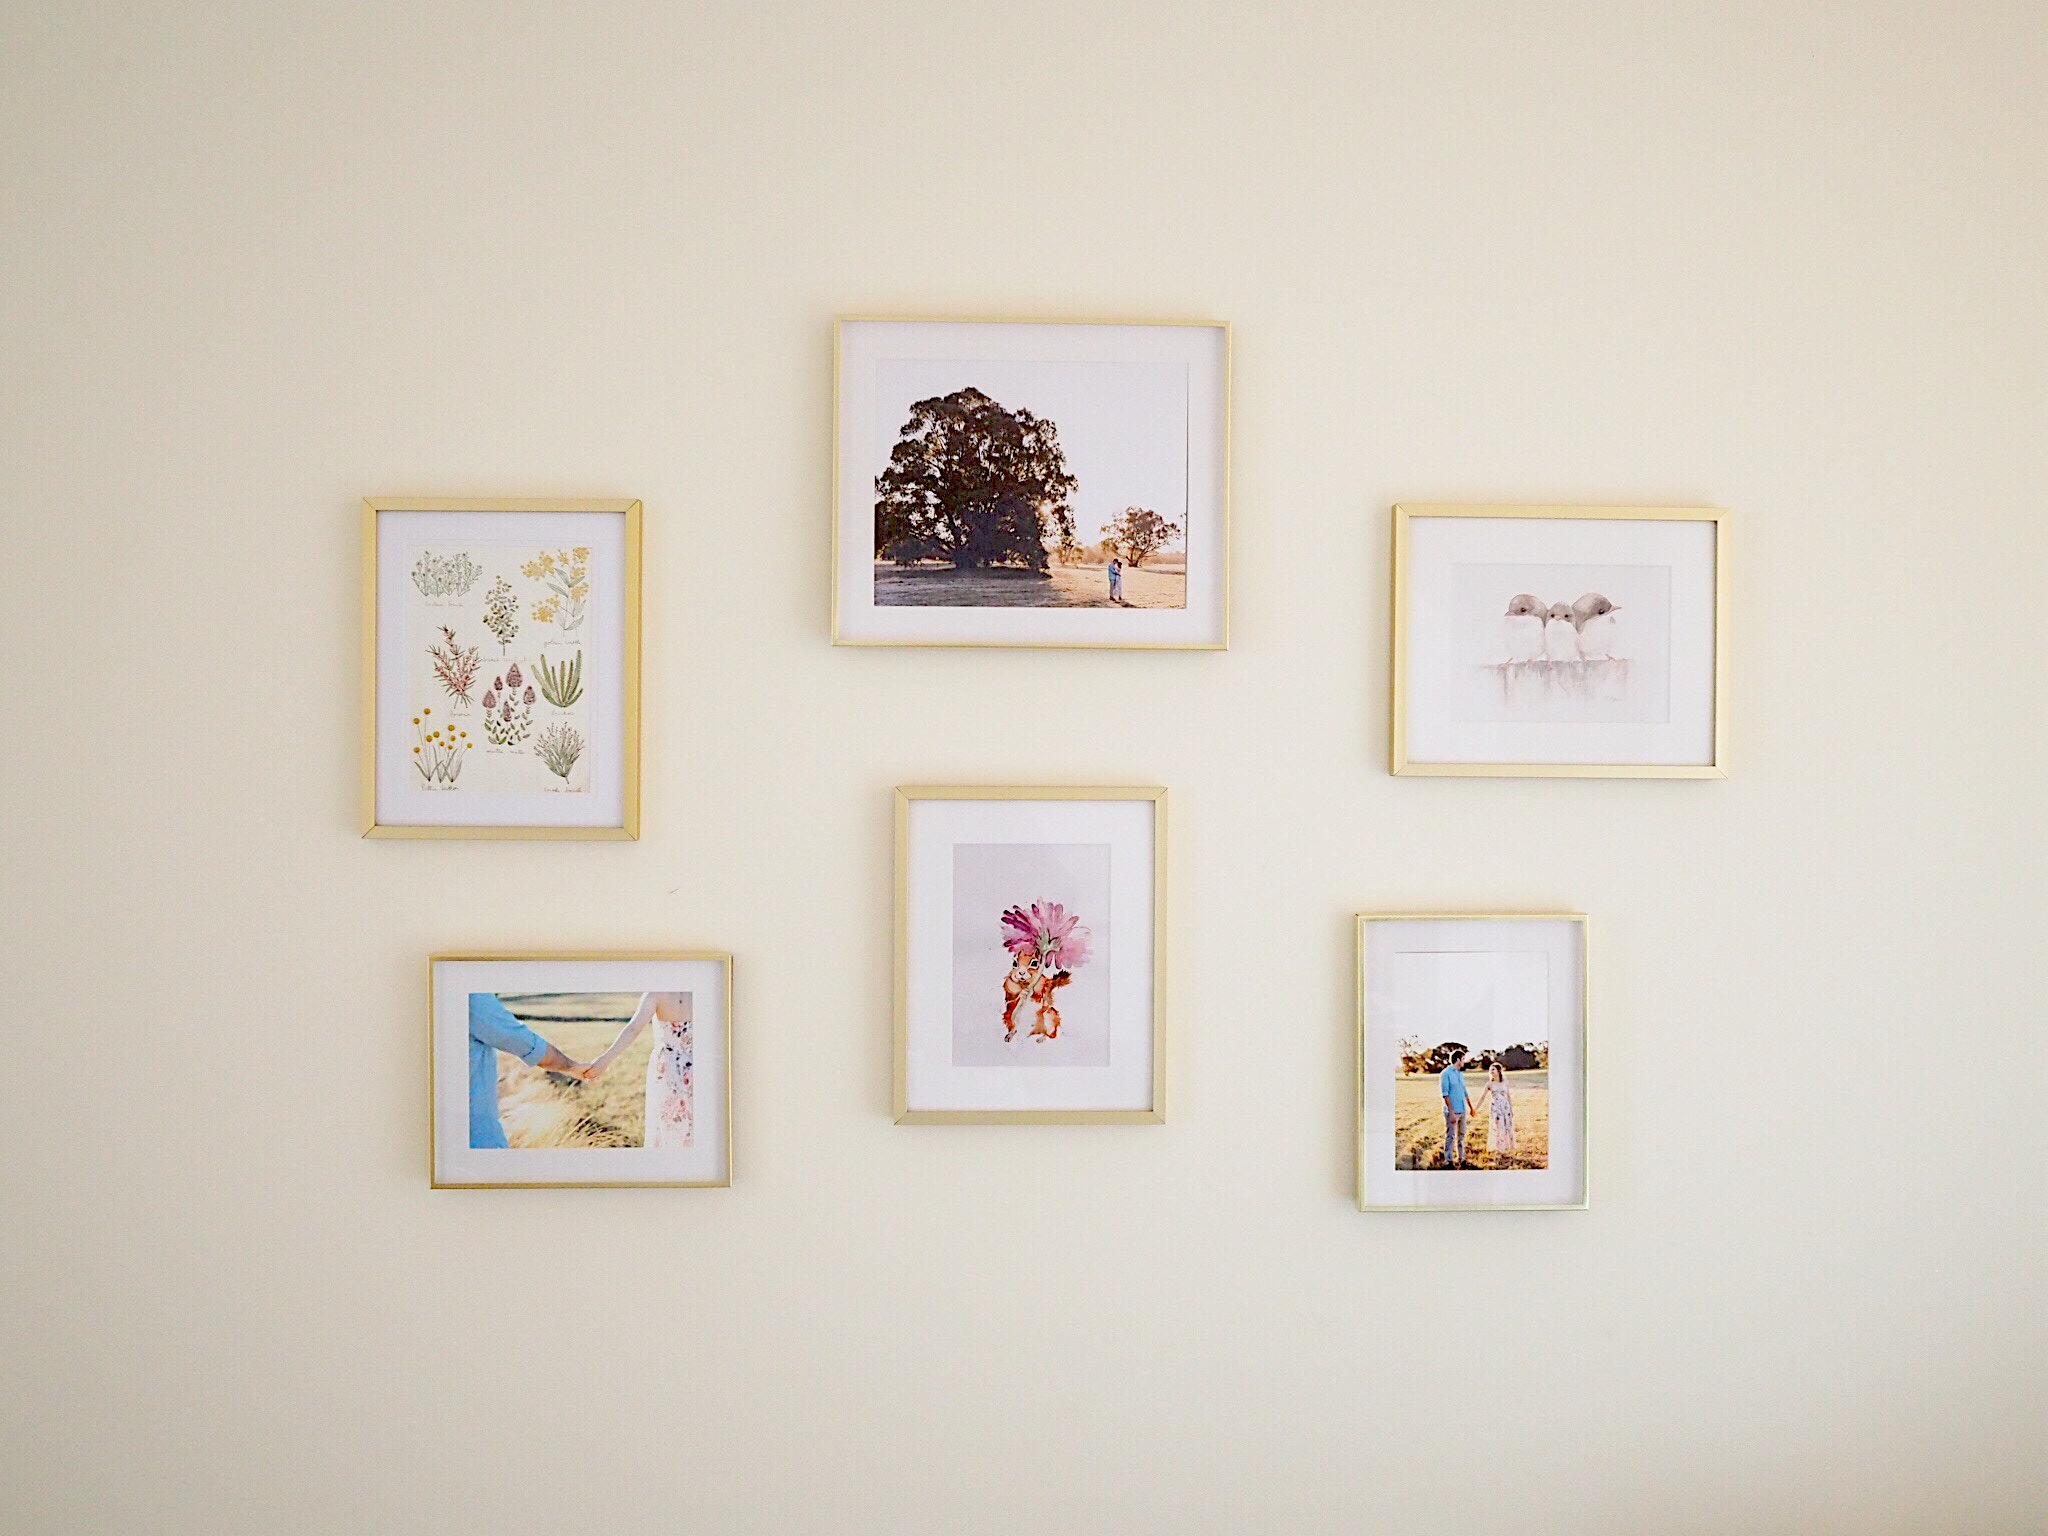 How To Build A Gallery Wall17475DED-A729-4616-A57A-900FC5E5F99C.JPG